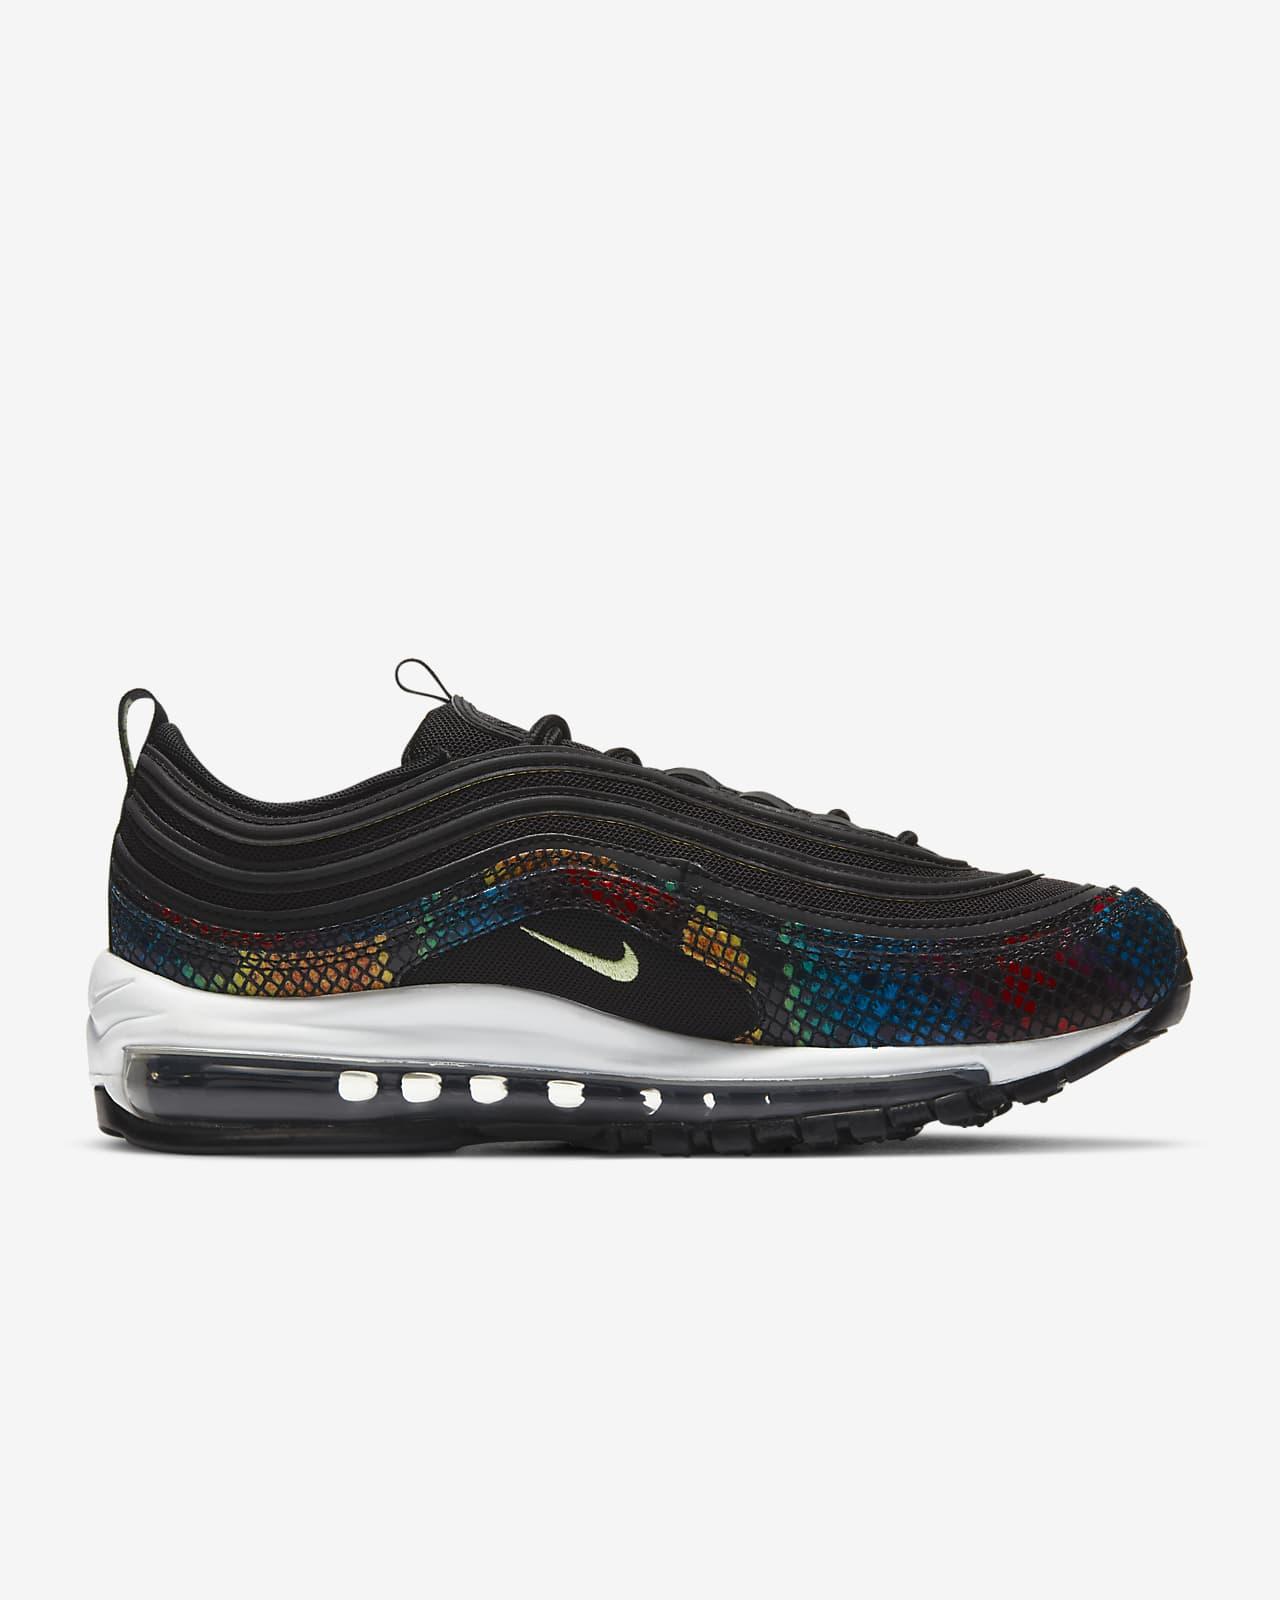 Nike Air Max 97 SE Women's Shoes